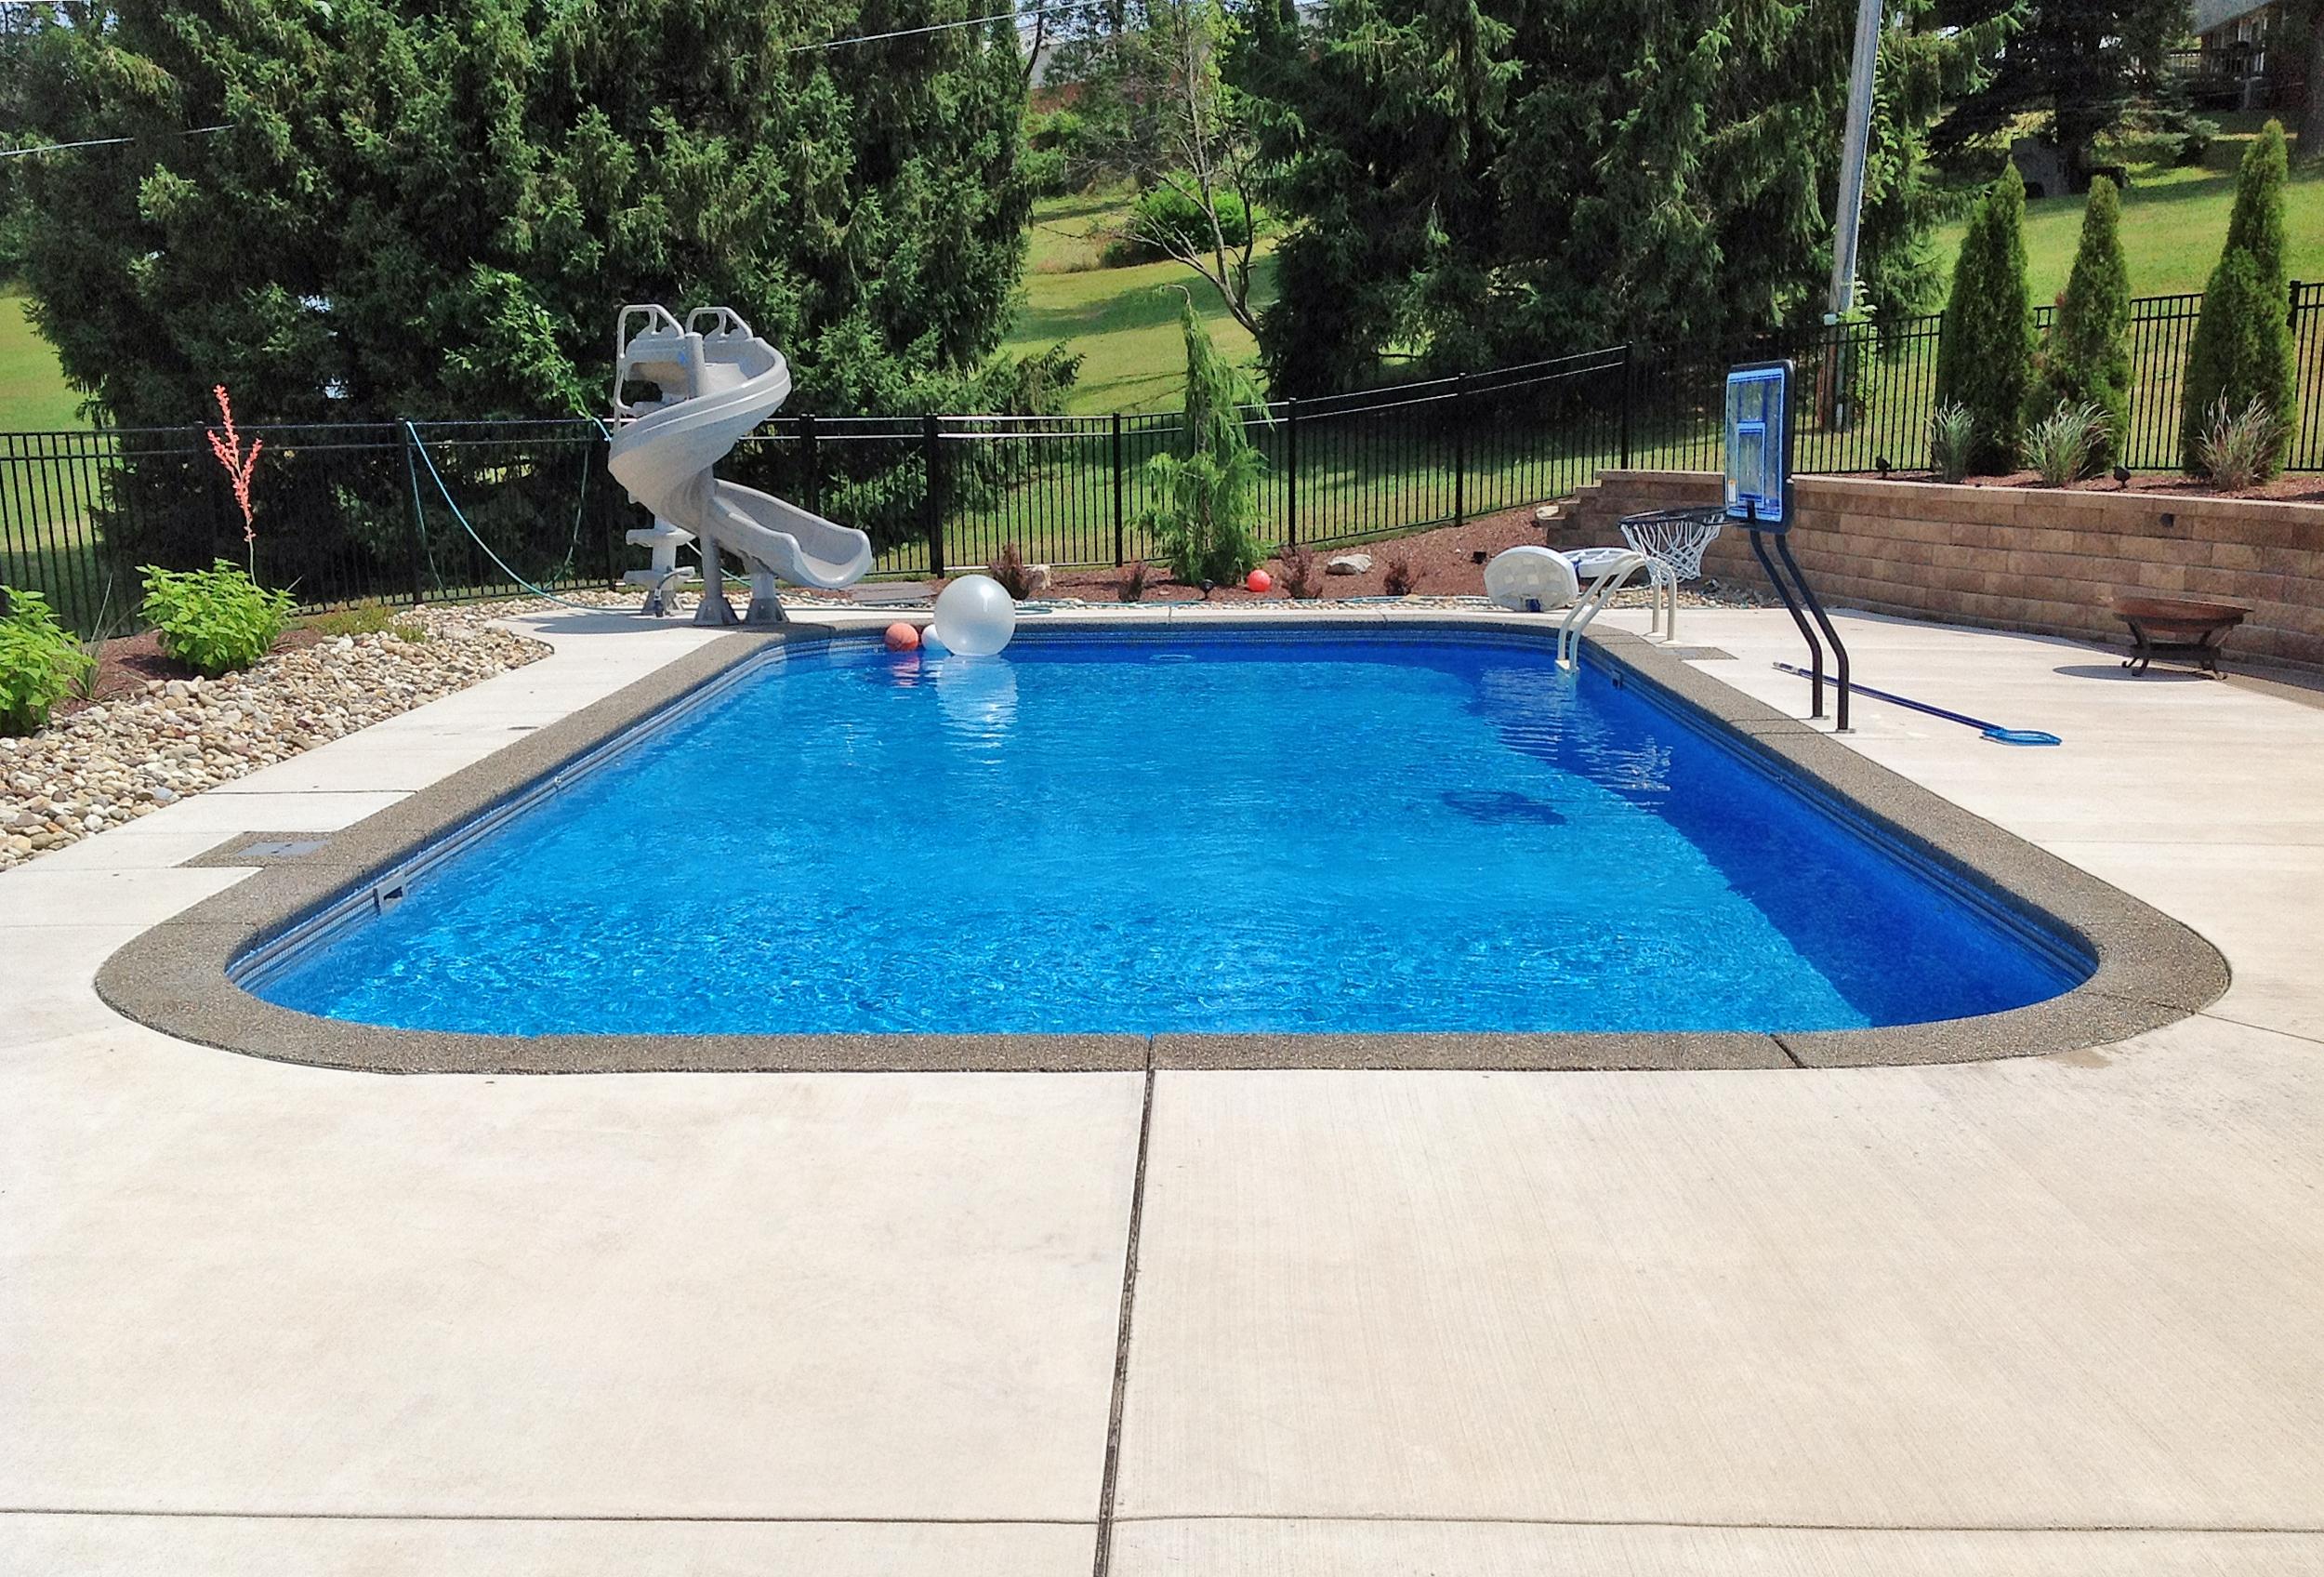 Emejing Pool Designs Mcmurray Pictures Decoration Design ...